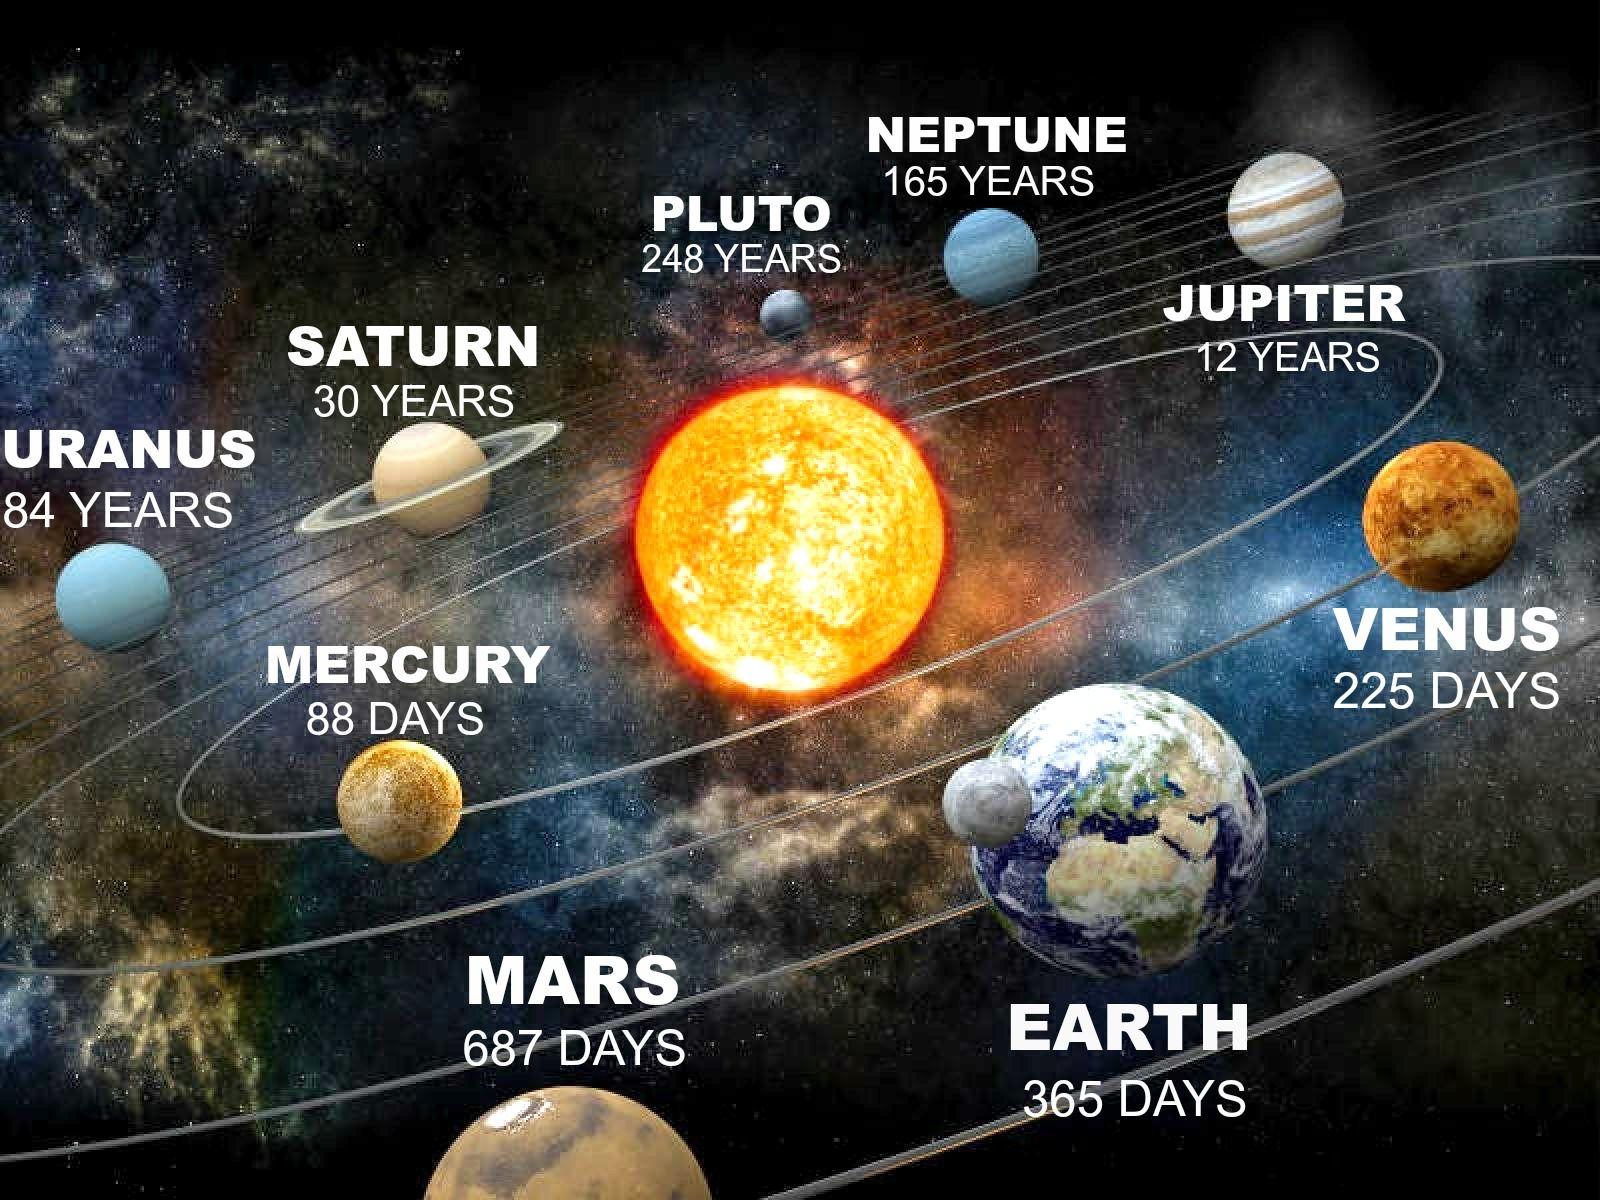 cd100531a1c2b8c3b982192f53f36653 - How Long Does It Take To Get Around The Earth